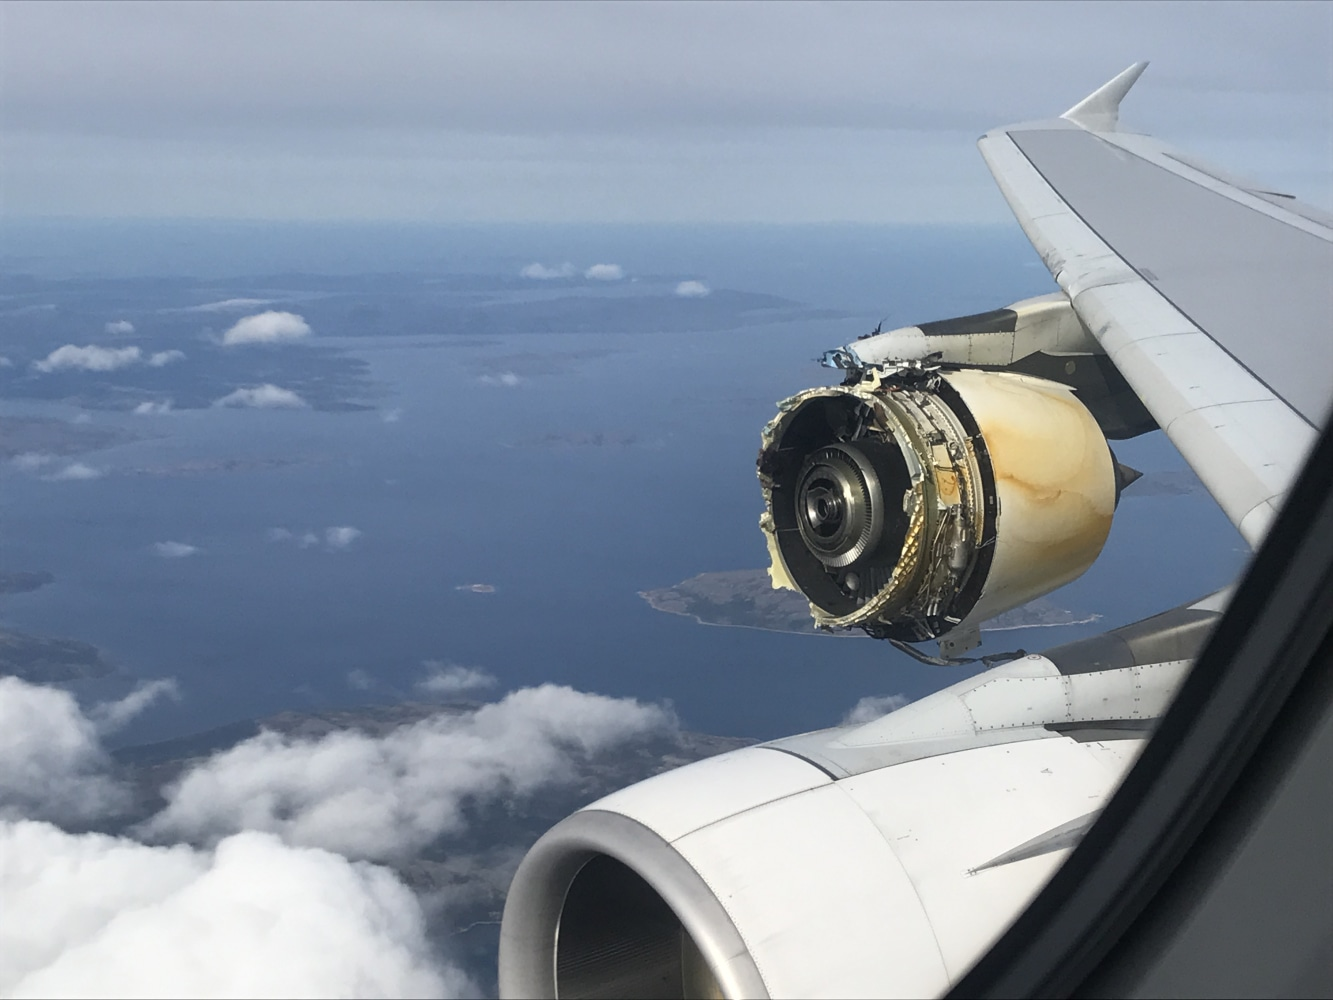 Air France flight to Los Angeles diverted after engine damage